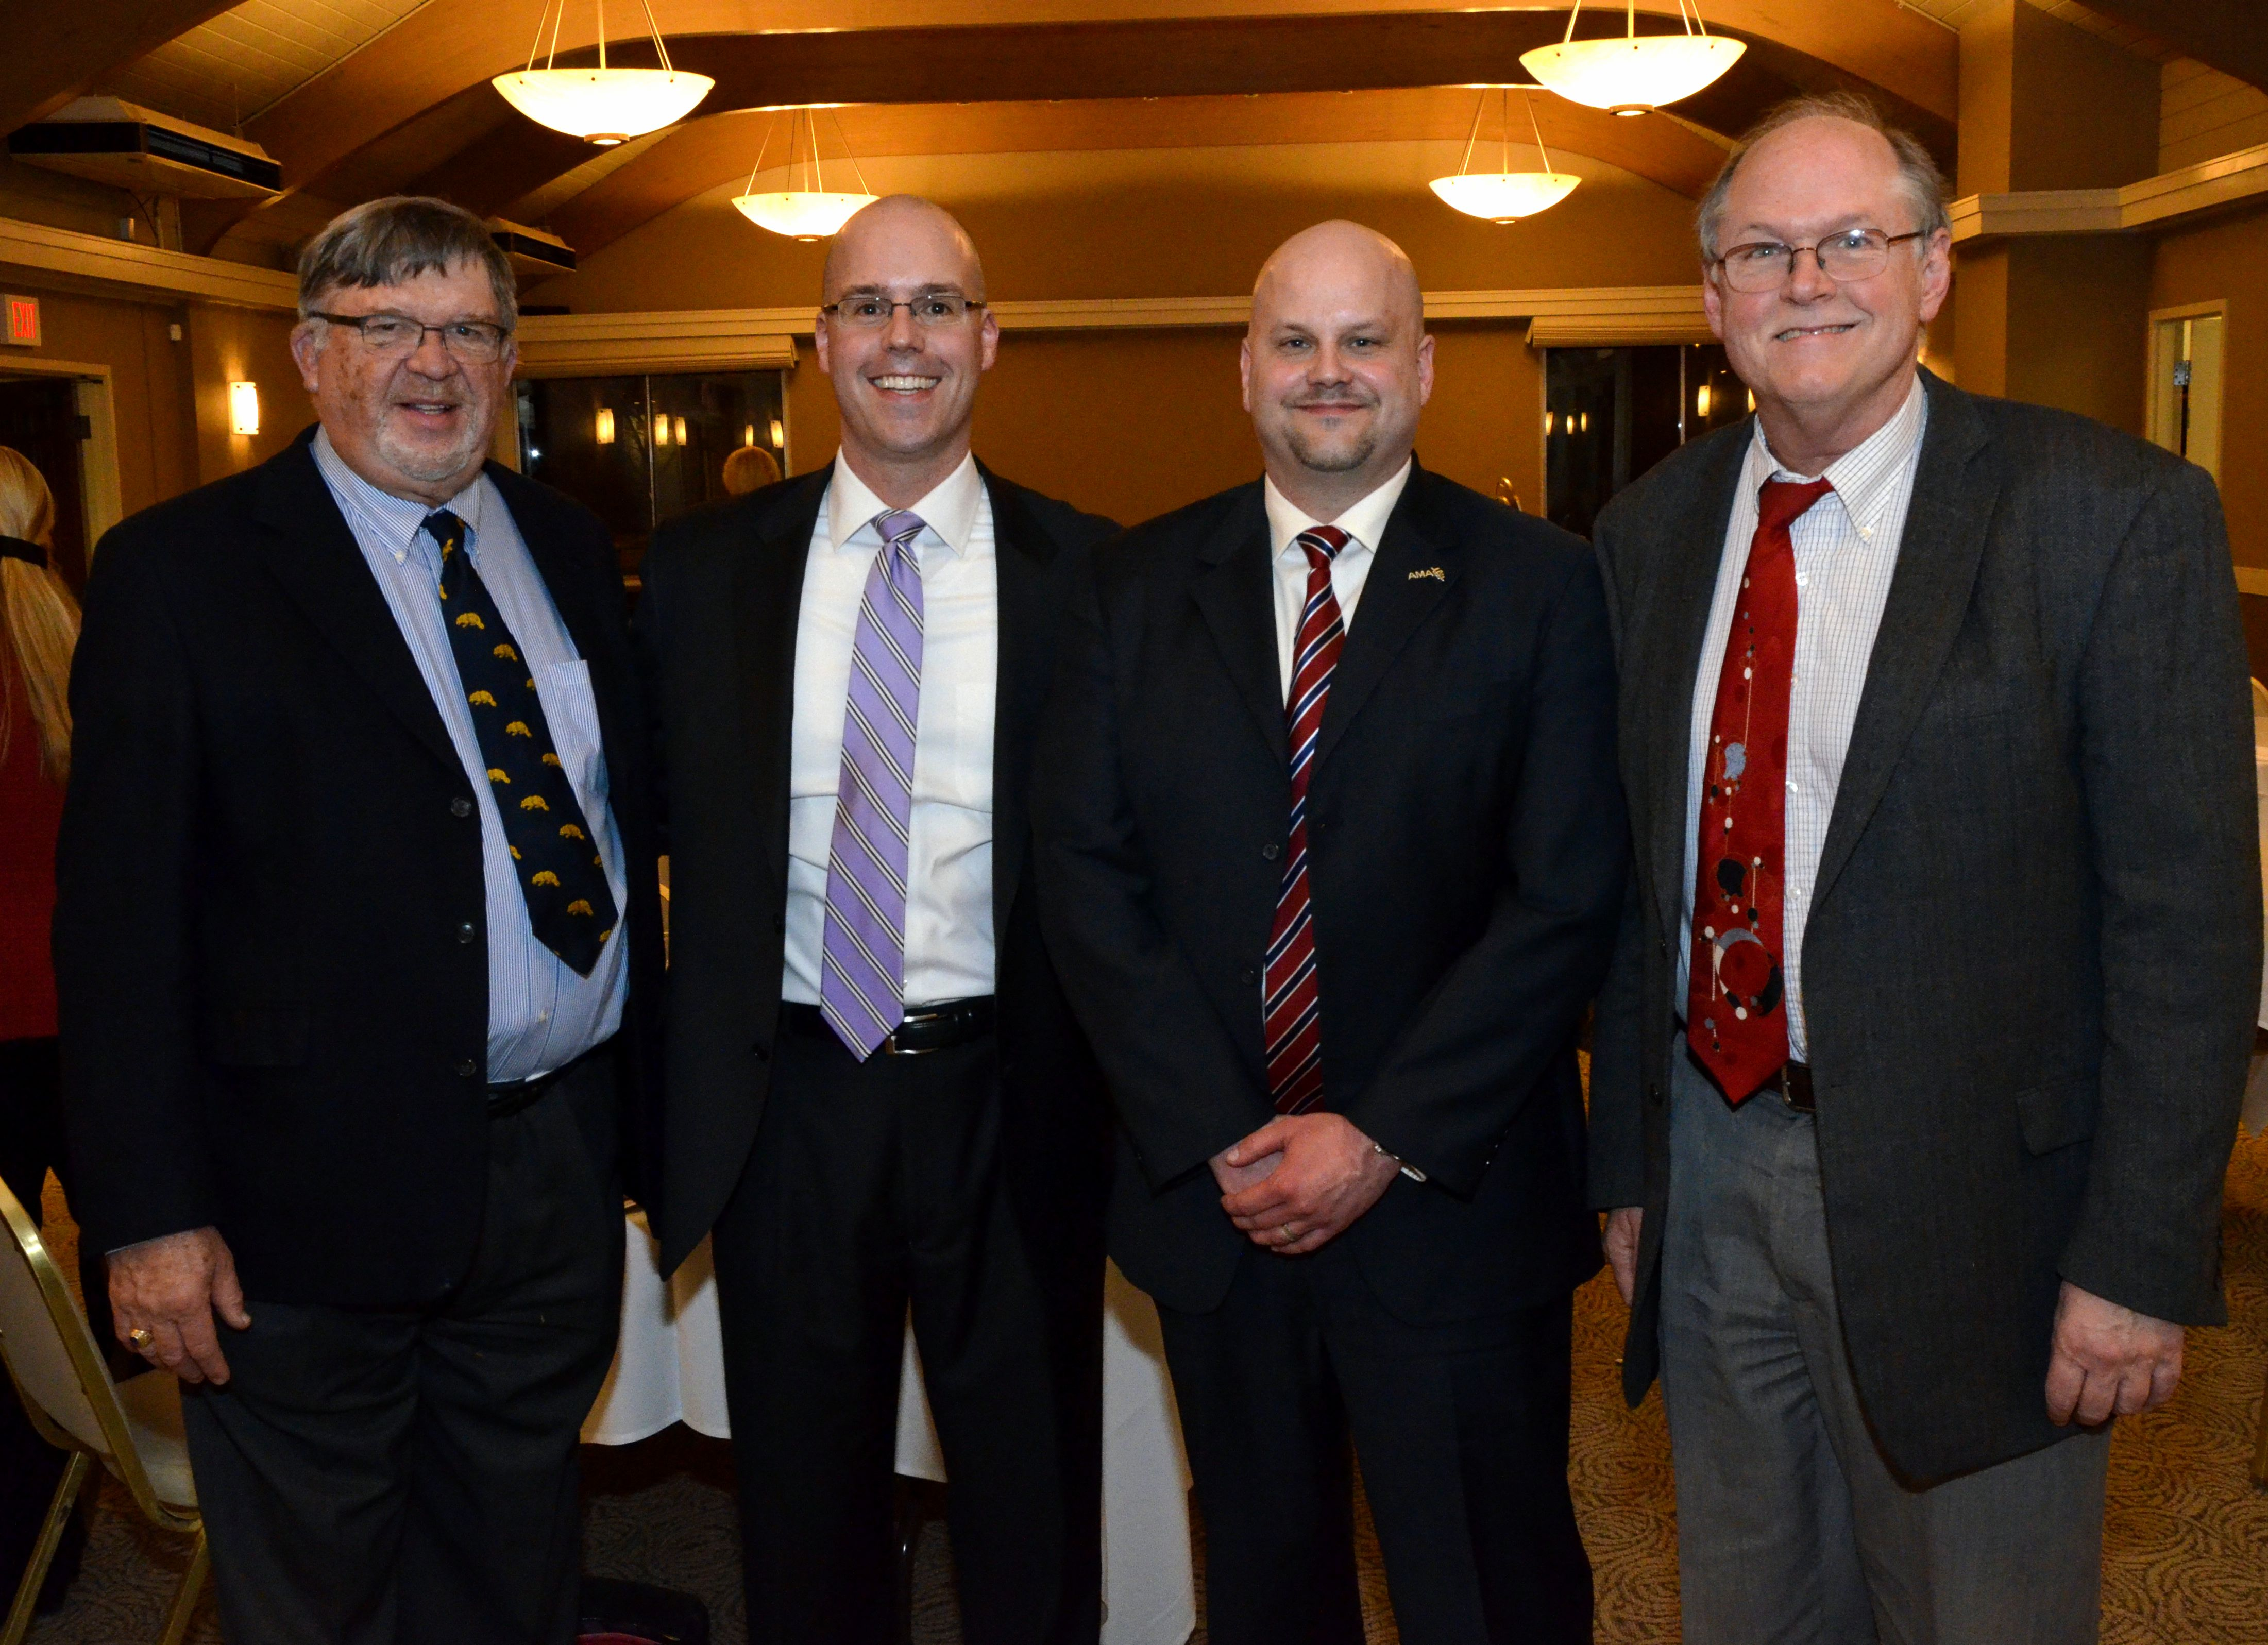 WCMS Past President Charles F, Koopmann, Jr., MD; AMA President-Elect Steven Stack, MD; President-Elect Brad J. Uren, MD, and President Larry Junck, MD